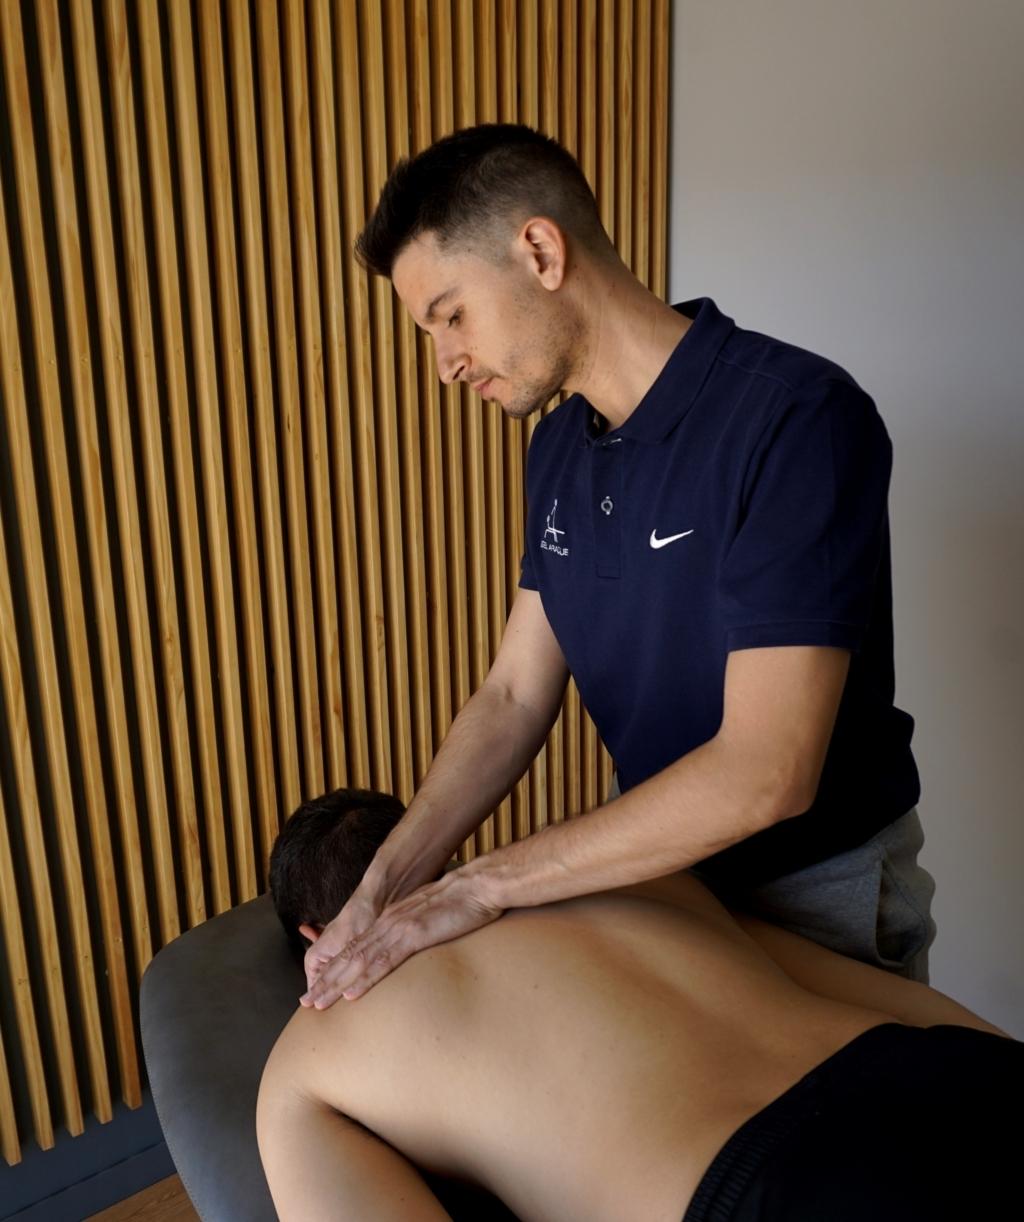 tratamiento-de-cervicalgia-clinica-fisioterapia-tres-olivos